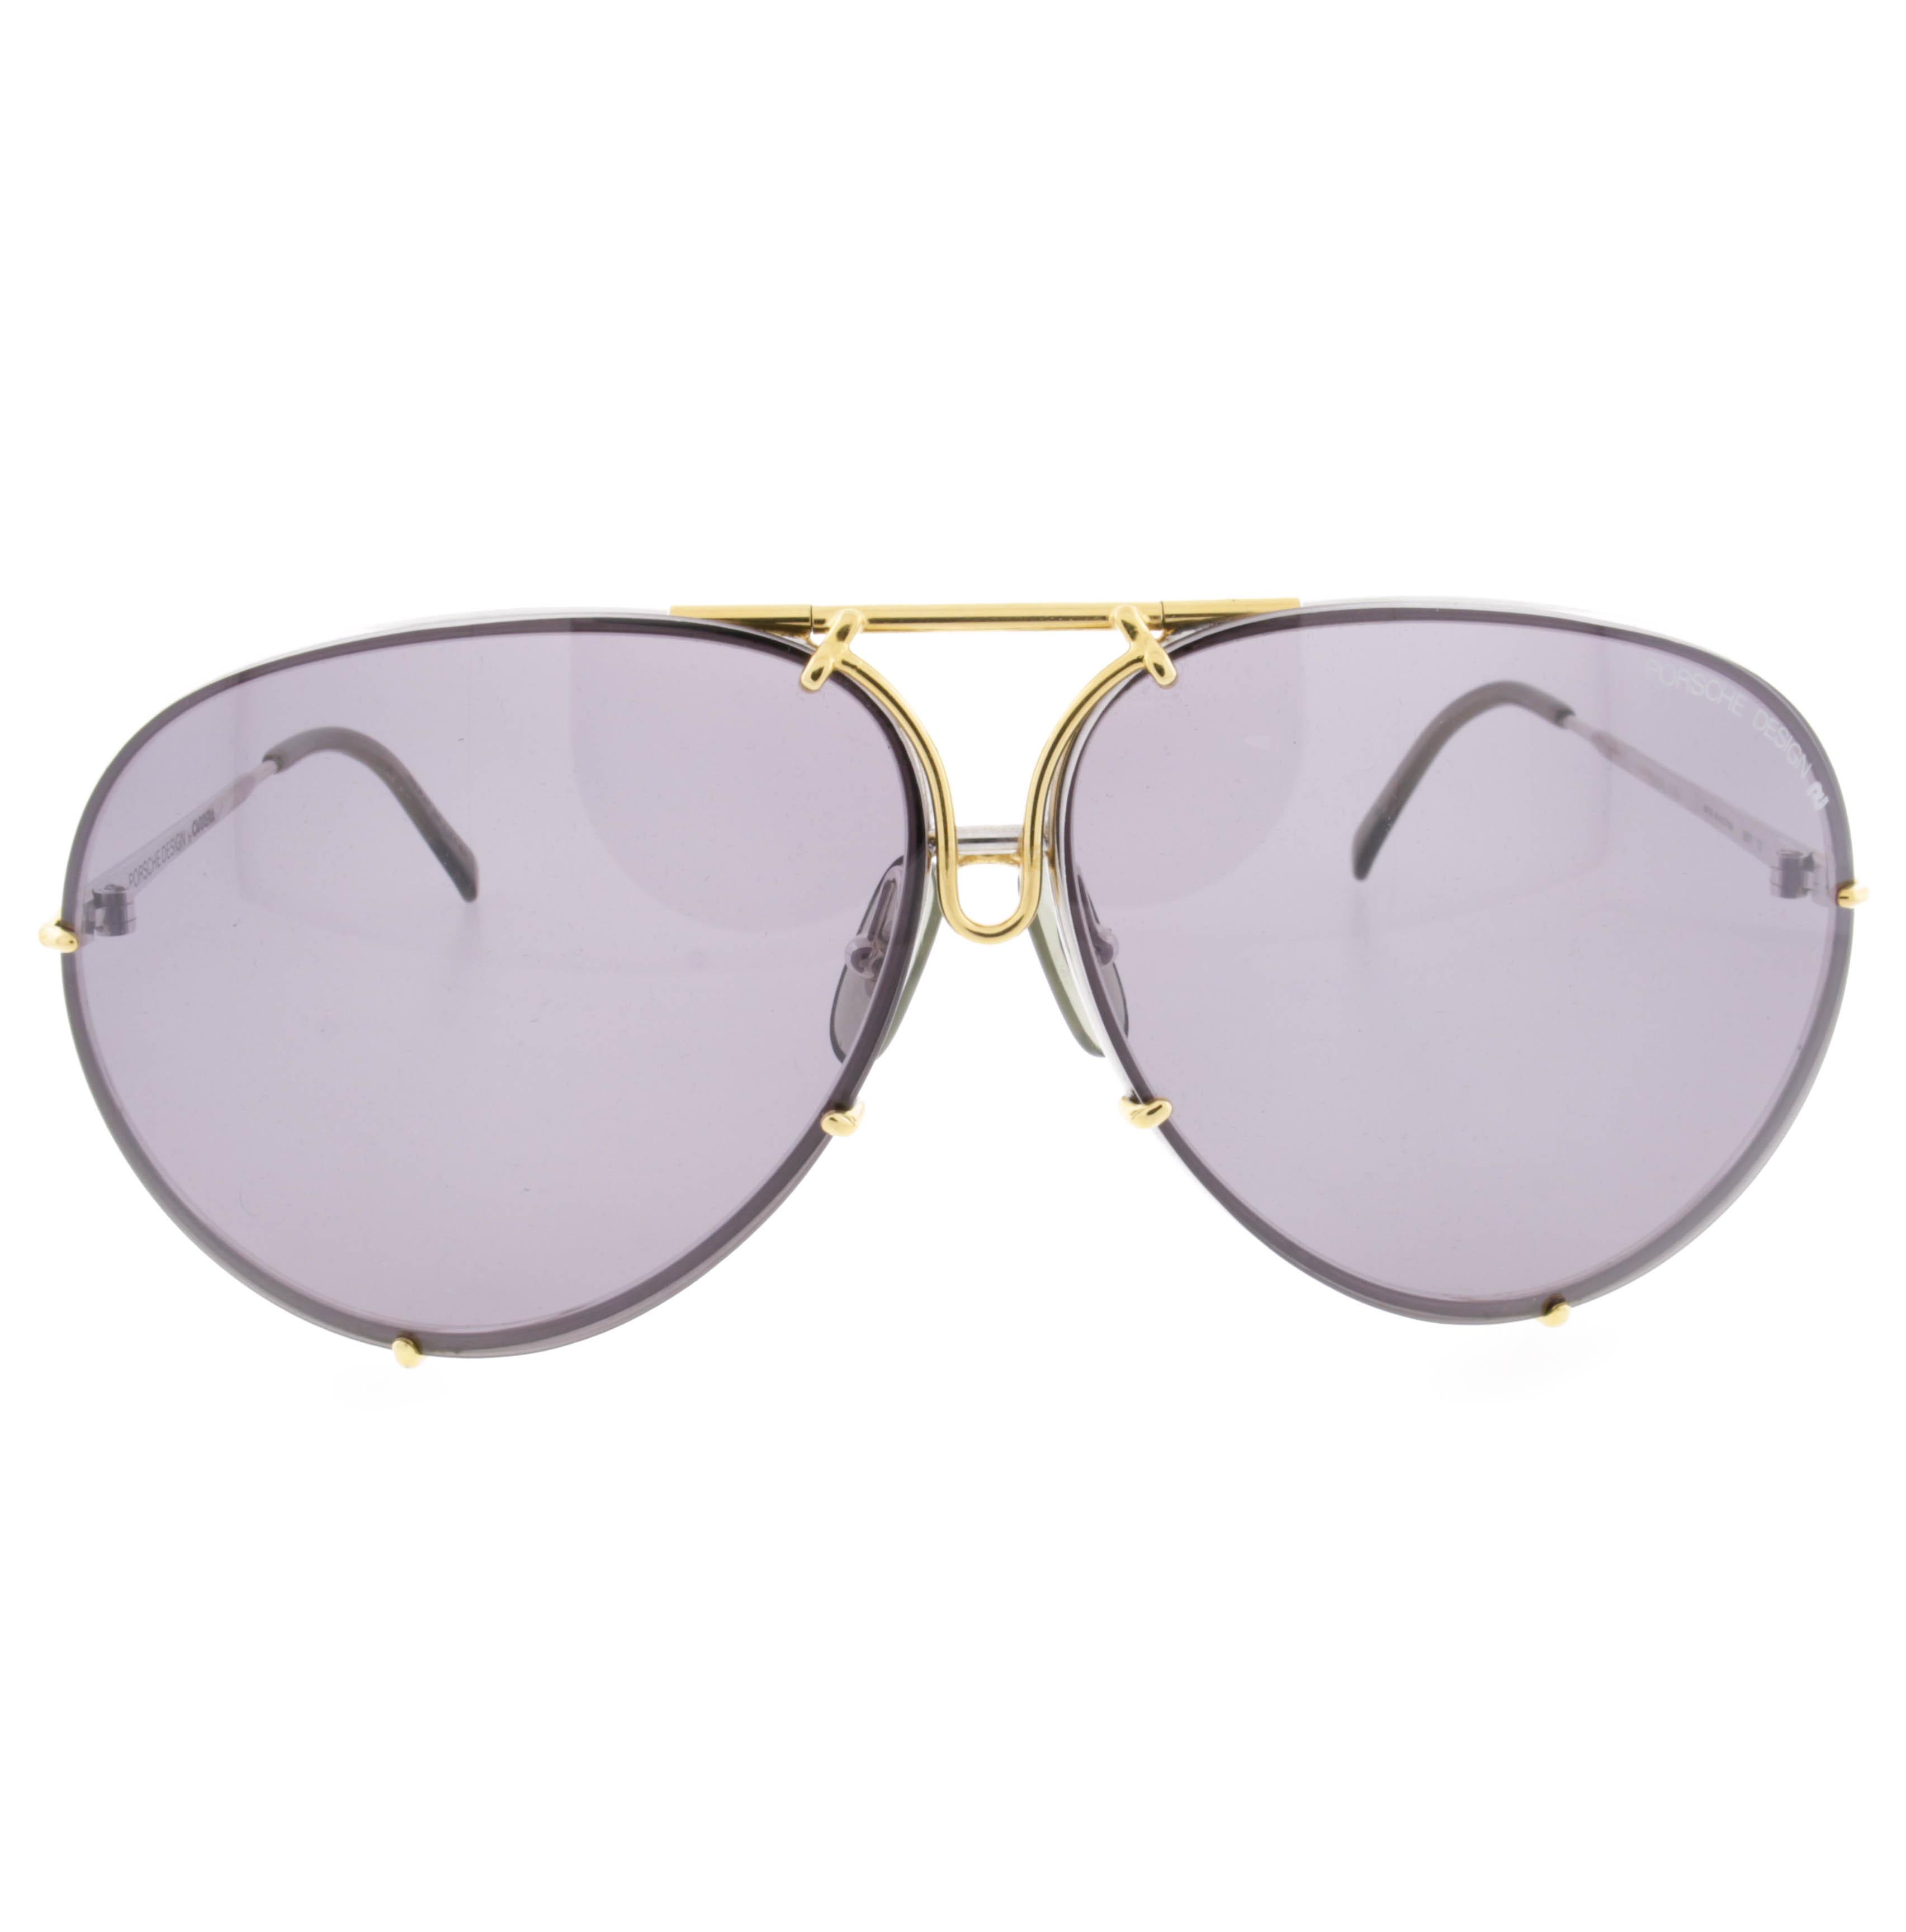 Gold Frame Carrera Sunglasses : Vintage Porsche Carrera 5621 Mens Gold Platinum Frame ...